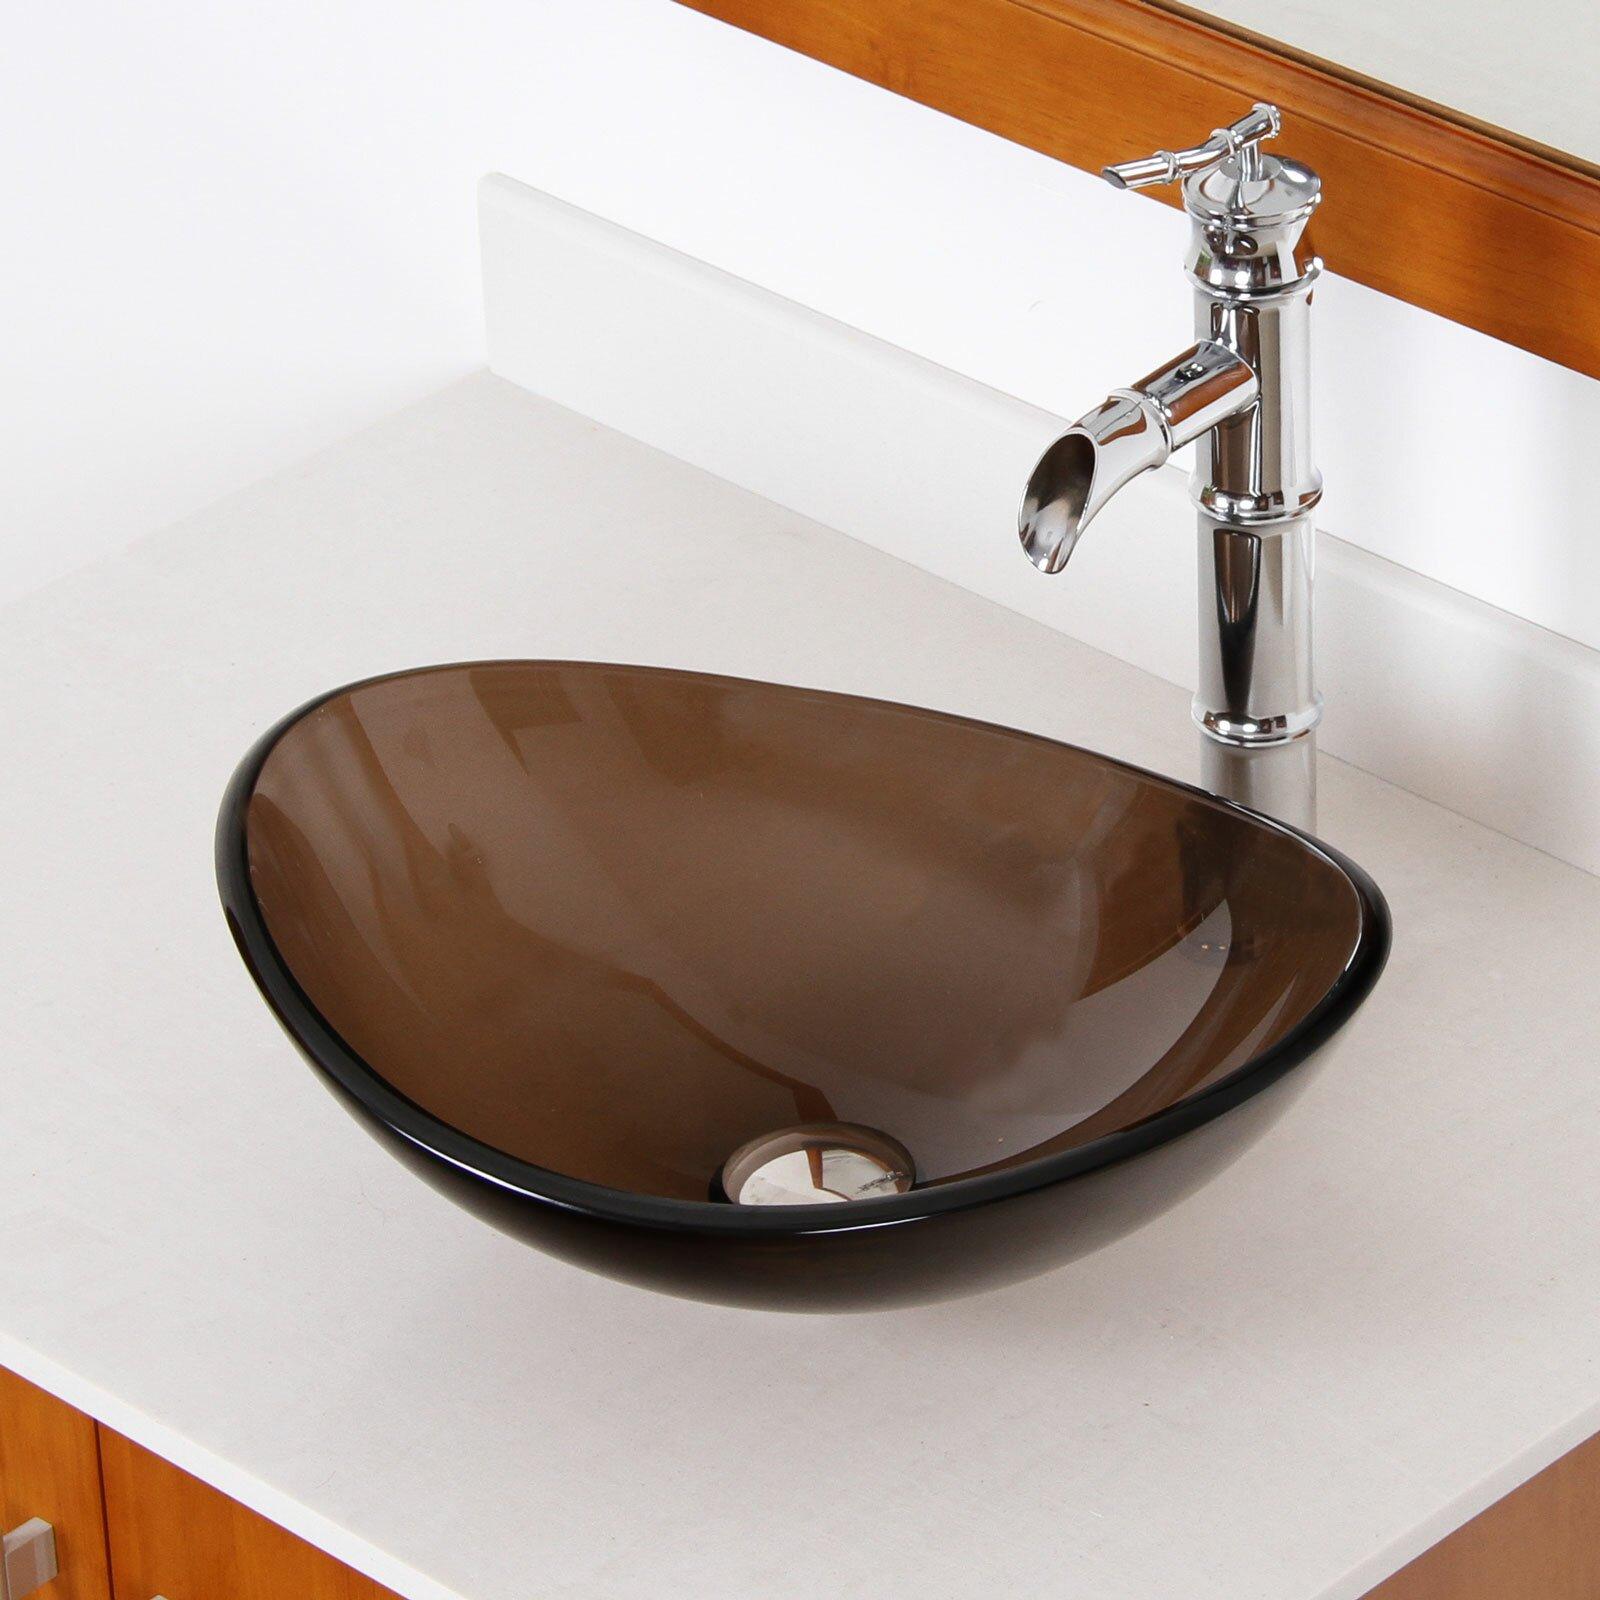 Oval Sink Bowl Befon for